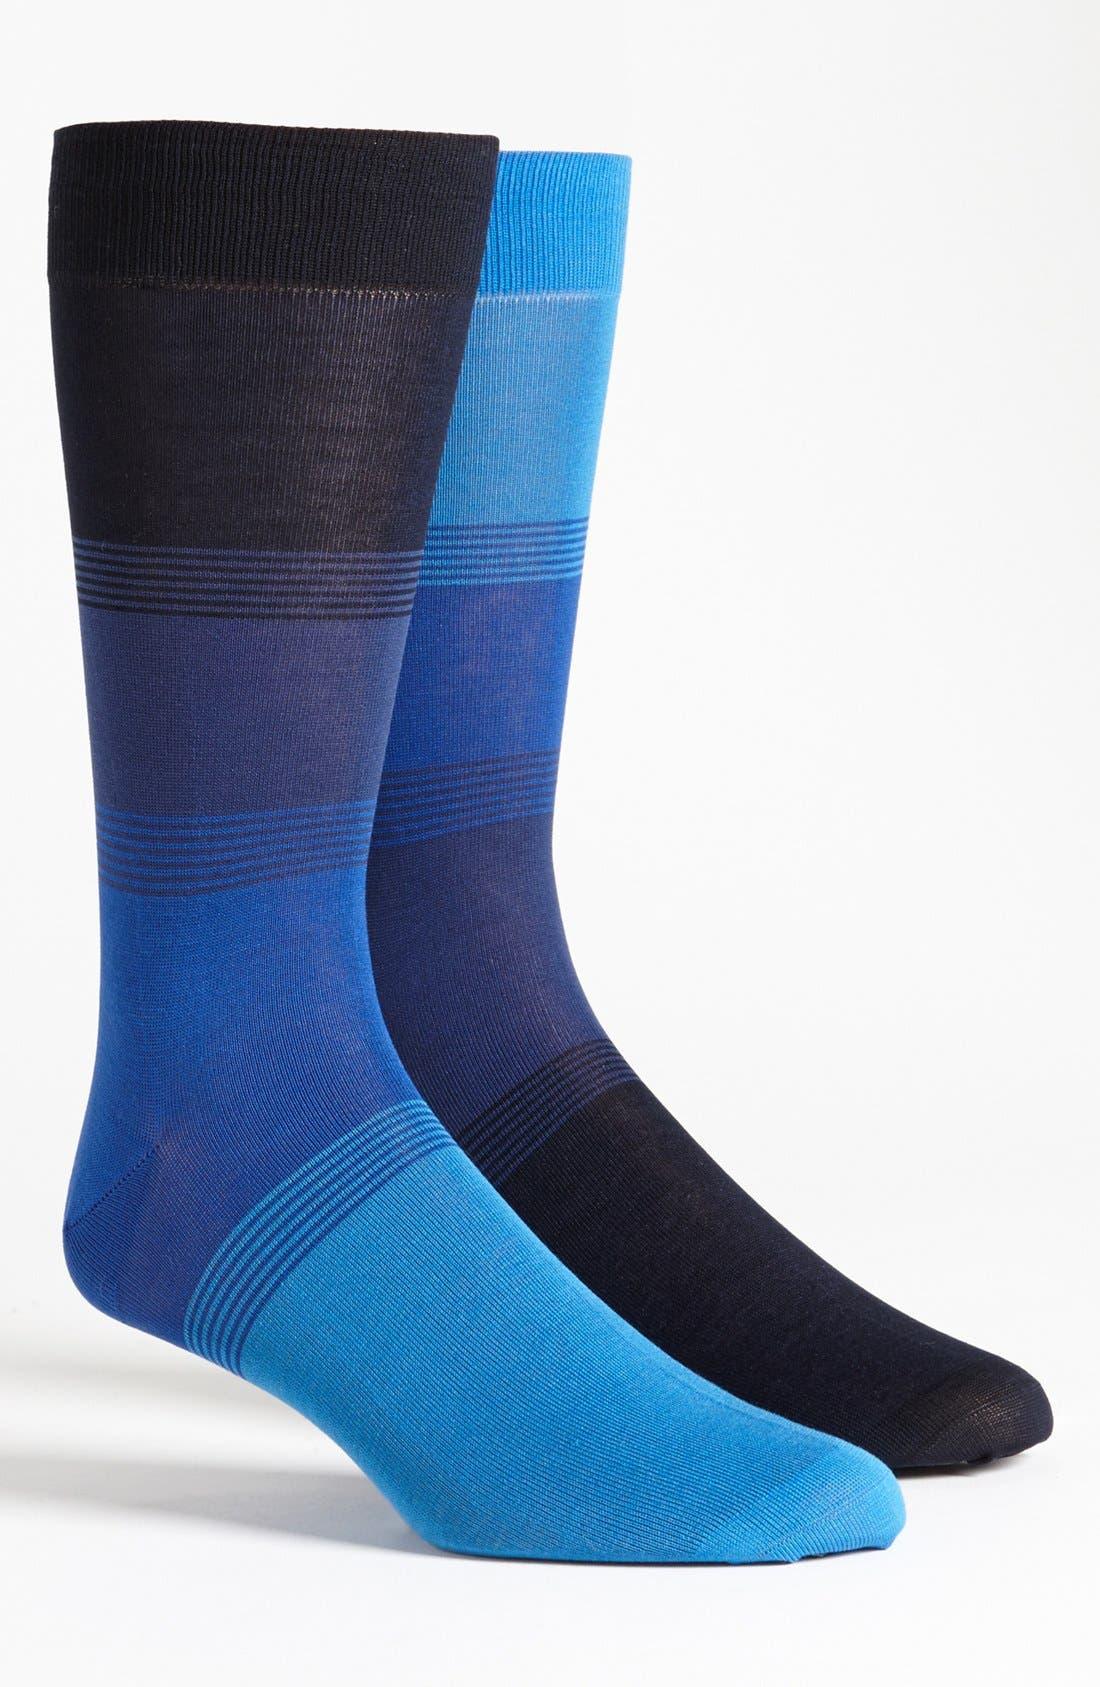 Alternate Image 1 Selected - Pantherella for Ted Baker London Stripe Socks